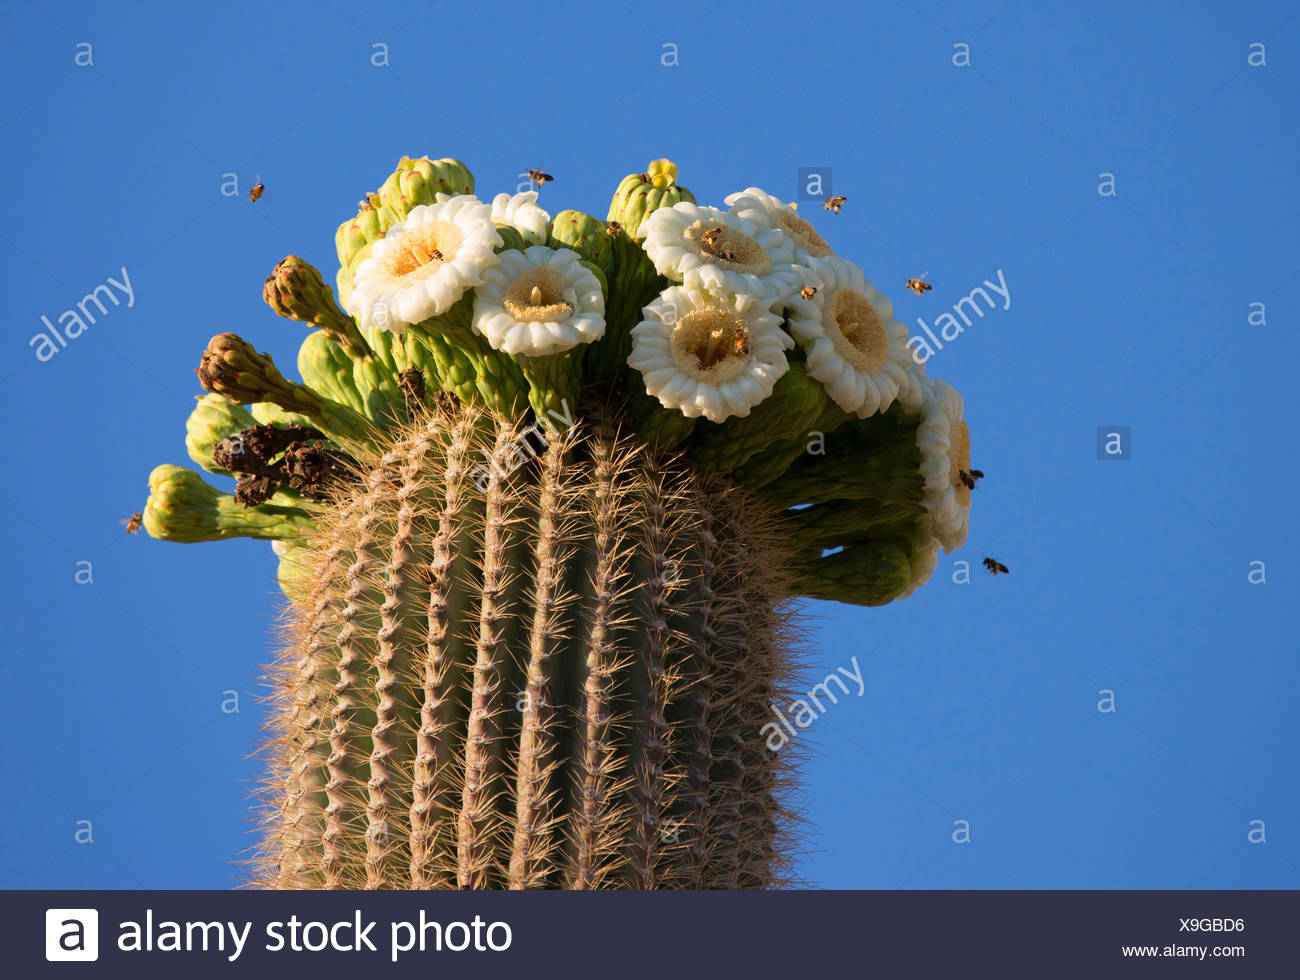 saguaro cactus (Carnegiea gigantea, Cereus giganteus), blooming, USA ...